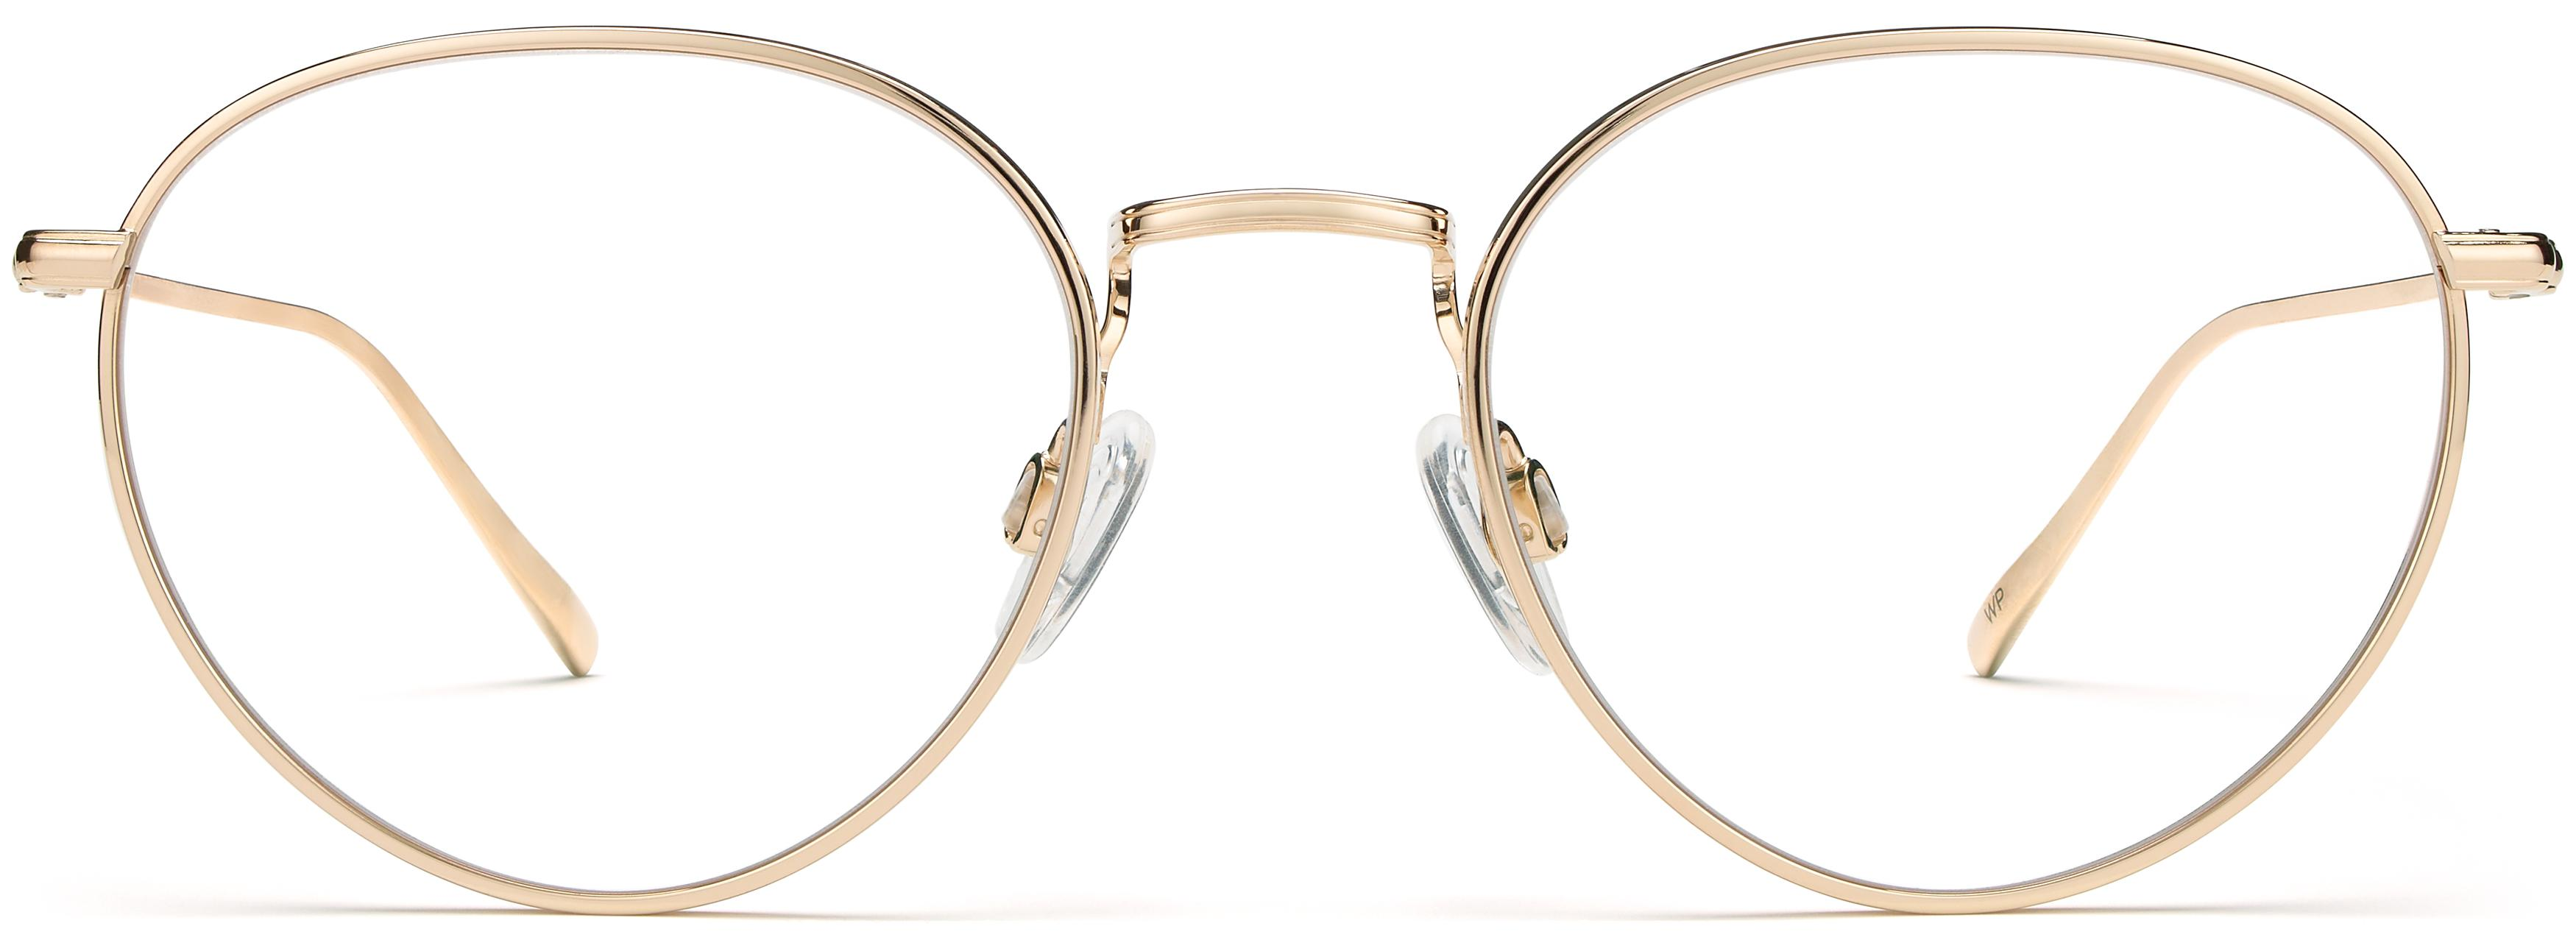 398ac64f08 Men s Eyeglasses